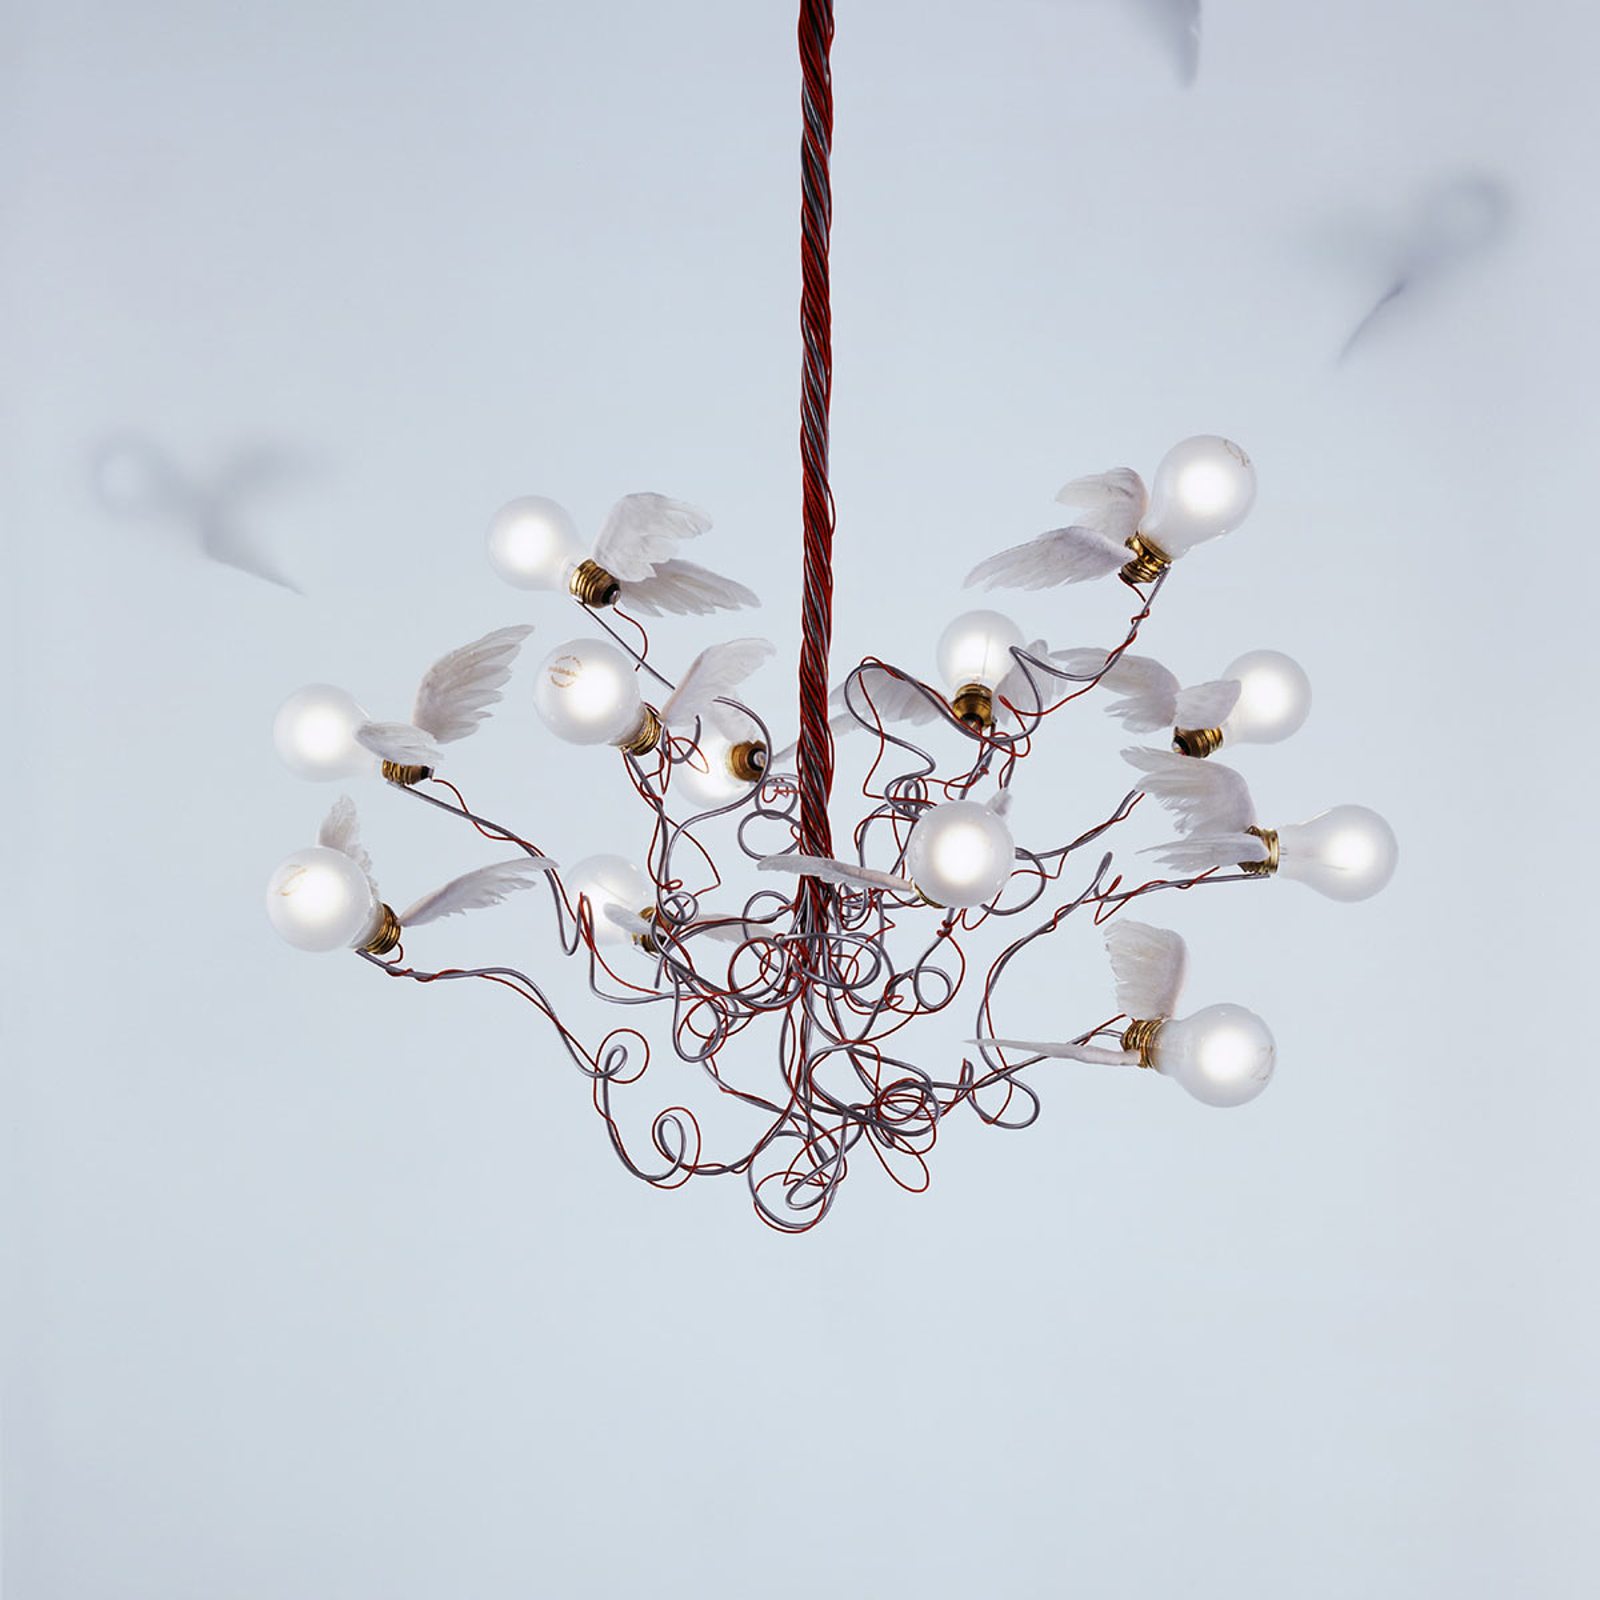 Ingo Maurer Birdie - LED hanglamp, kabel rood